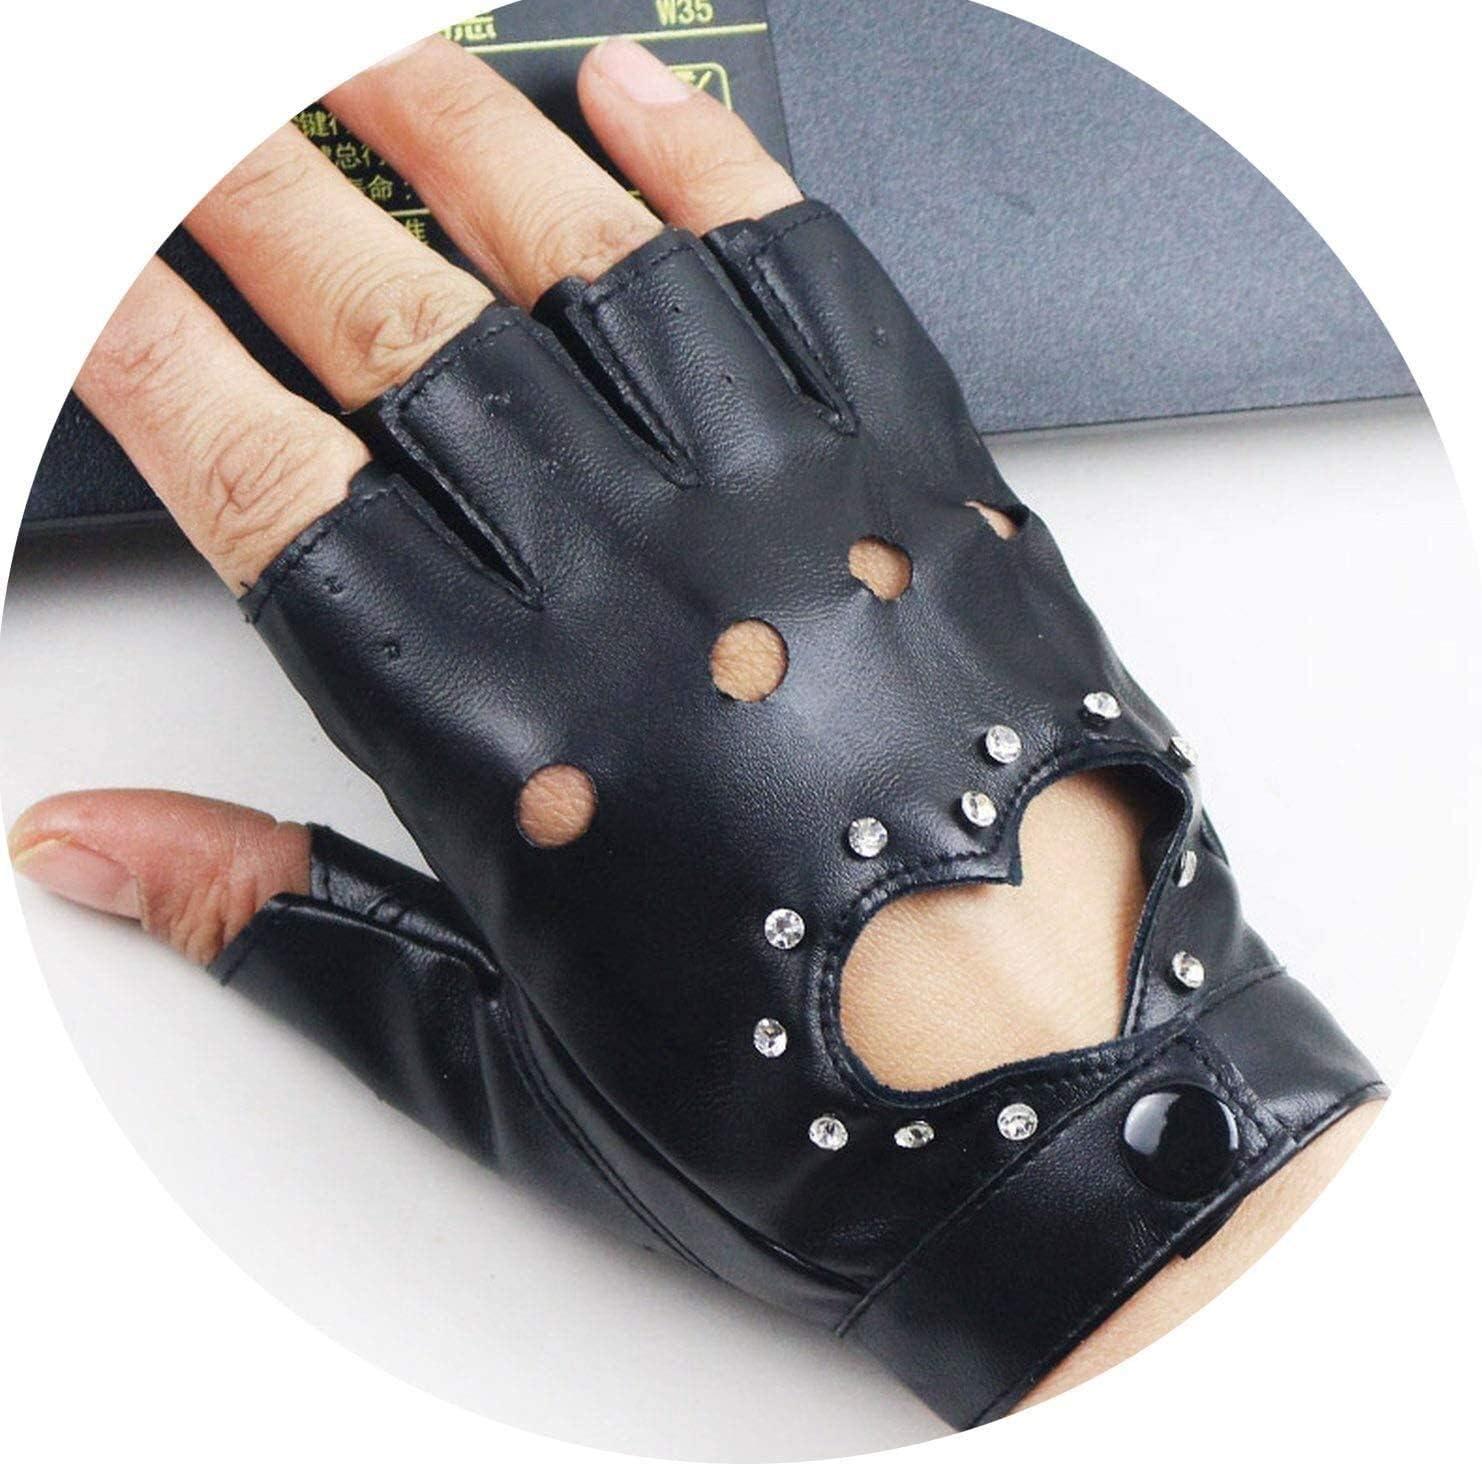 Samantha Warm Gloves Women PU Leather Gloves Female Night Club Rivets Punk Rock Show Half Finger Fitness Street Dance Thin Heart Gloves (Color : Rivets Black, Size : Oneszie)